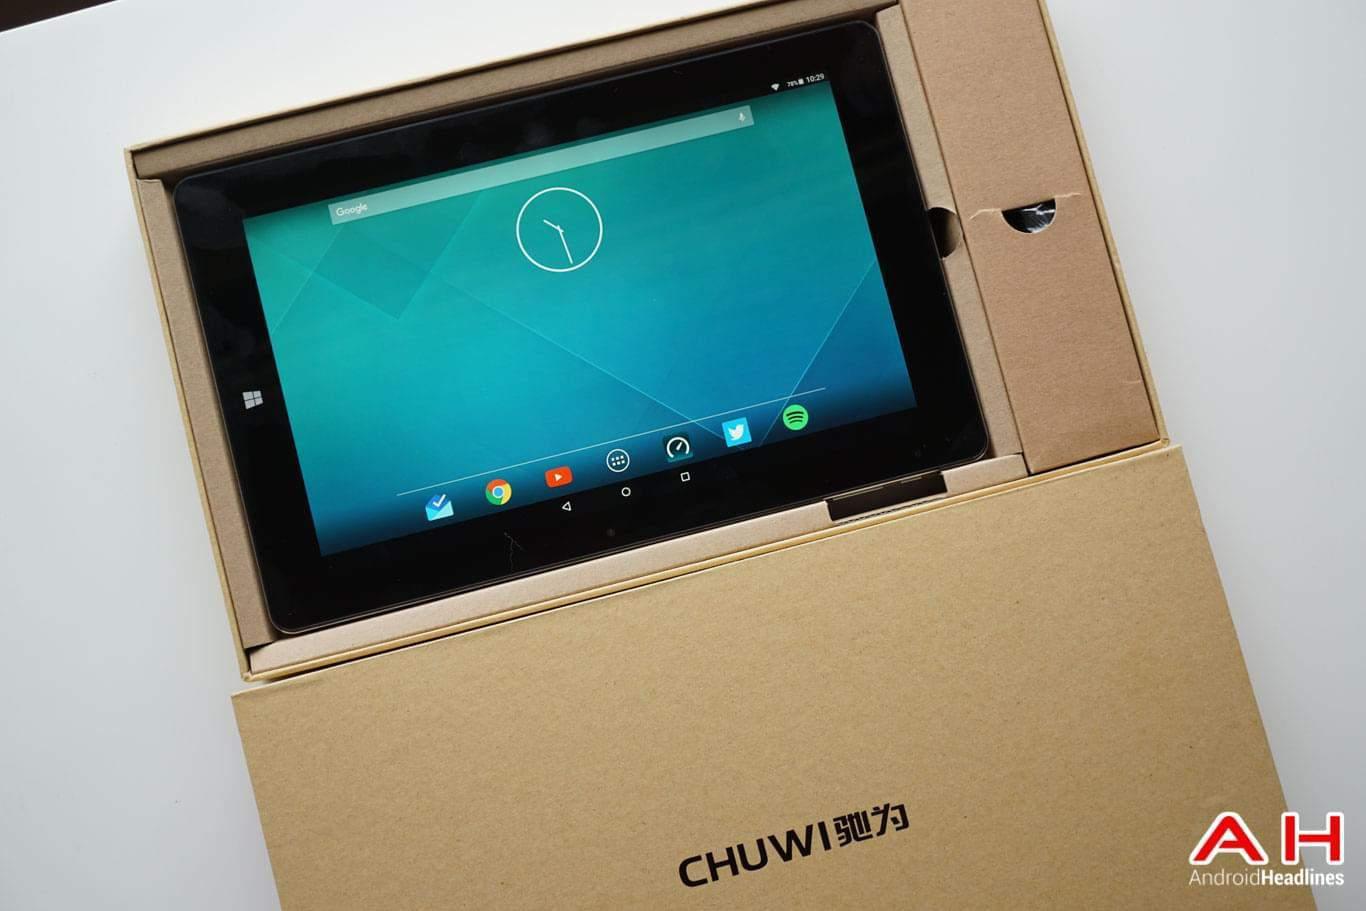 chuwi-hibook-pro-ah-2-1